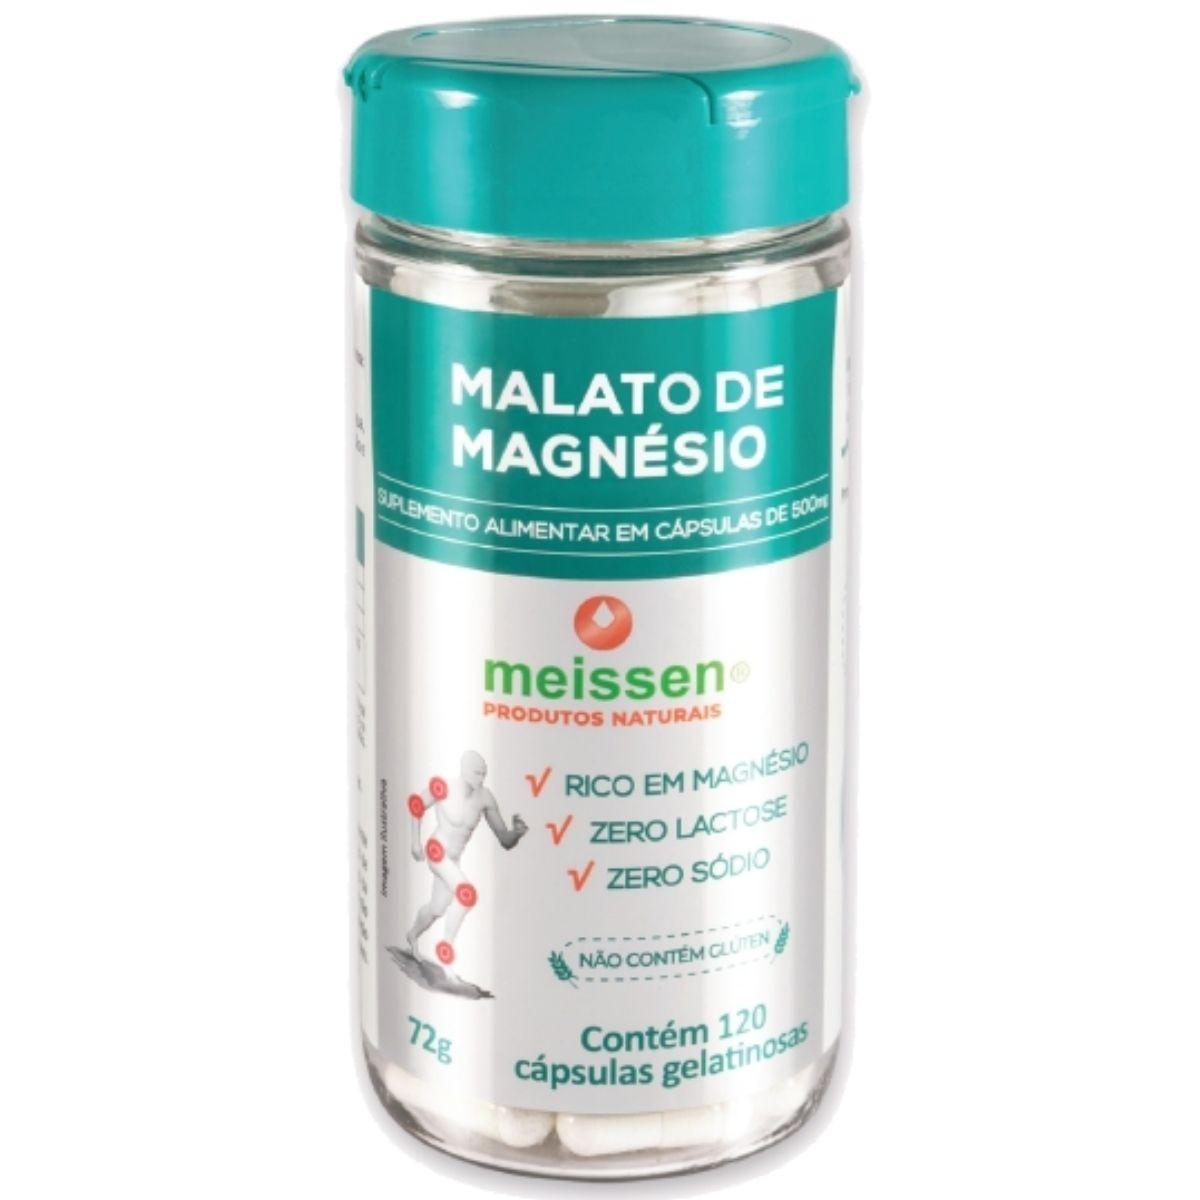 Malato de Magnésio (Magnésio Dimalato) Puro 120 Cápsulas Gelatina - Meissen